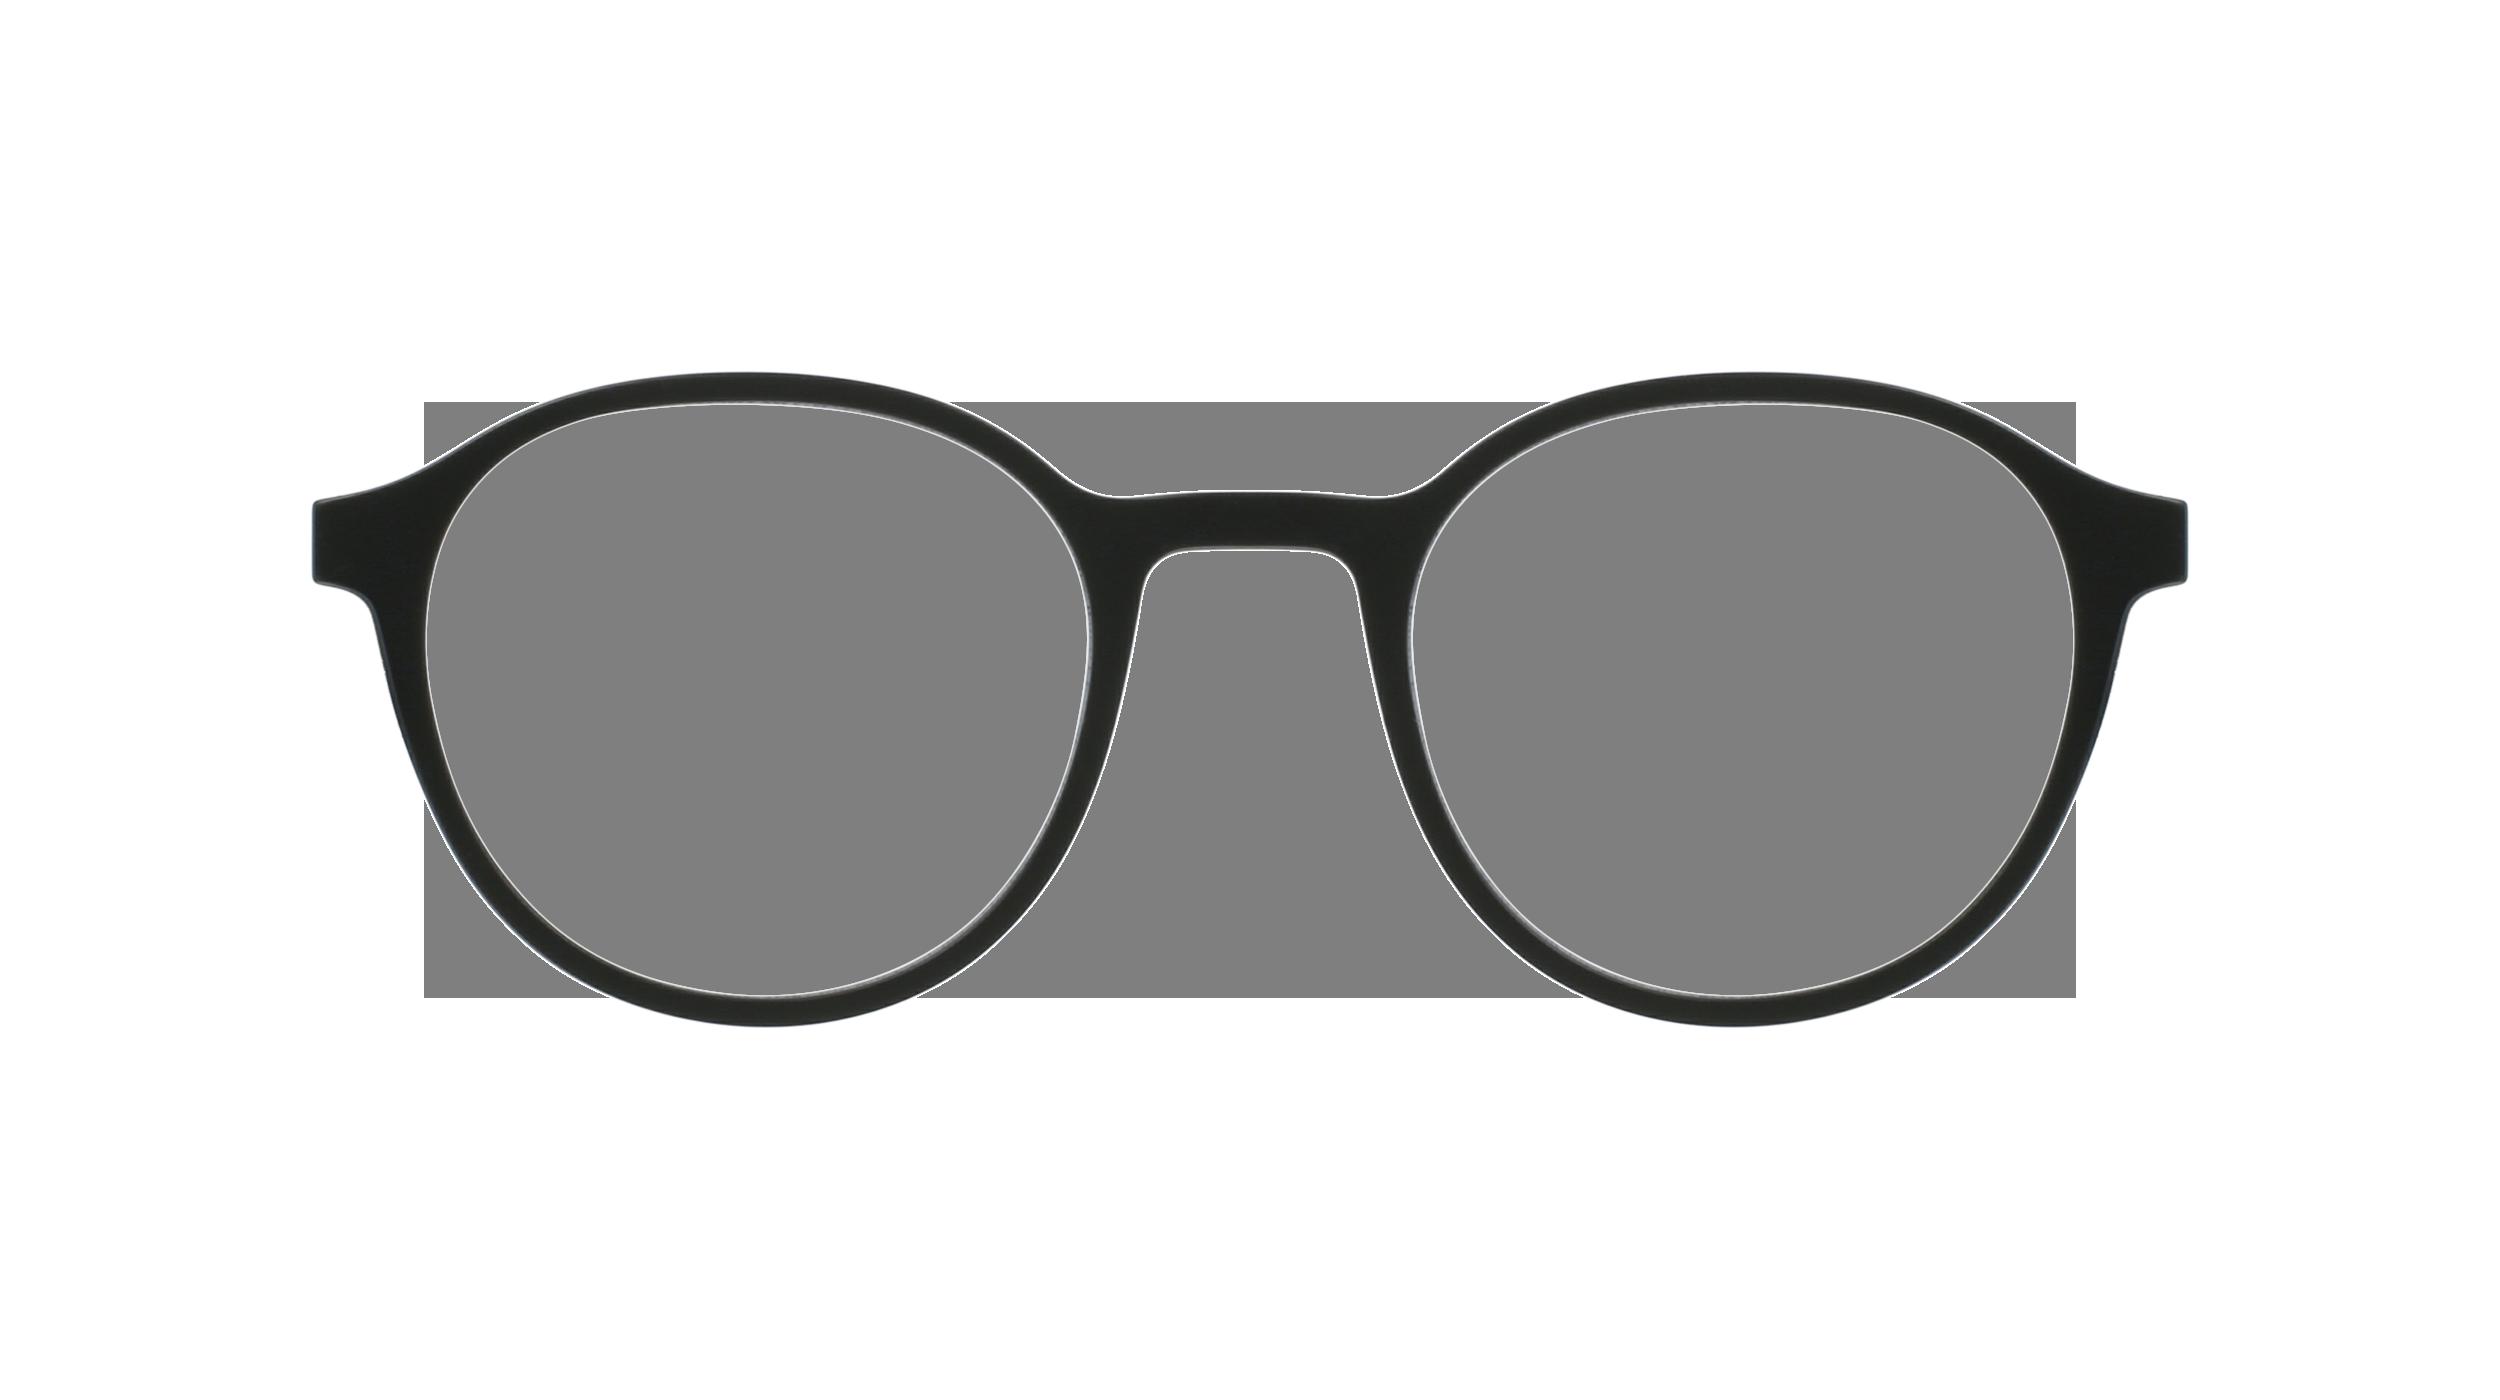 afflelou/france/products/smart_clip/clips_glasses/07630036458822.png